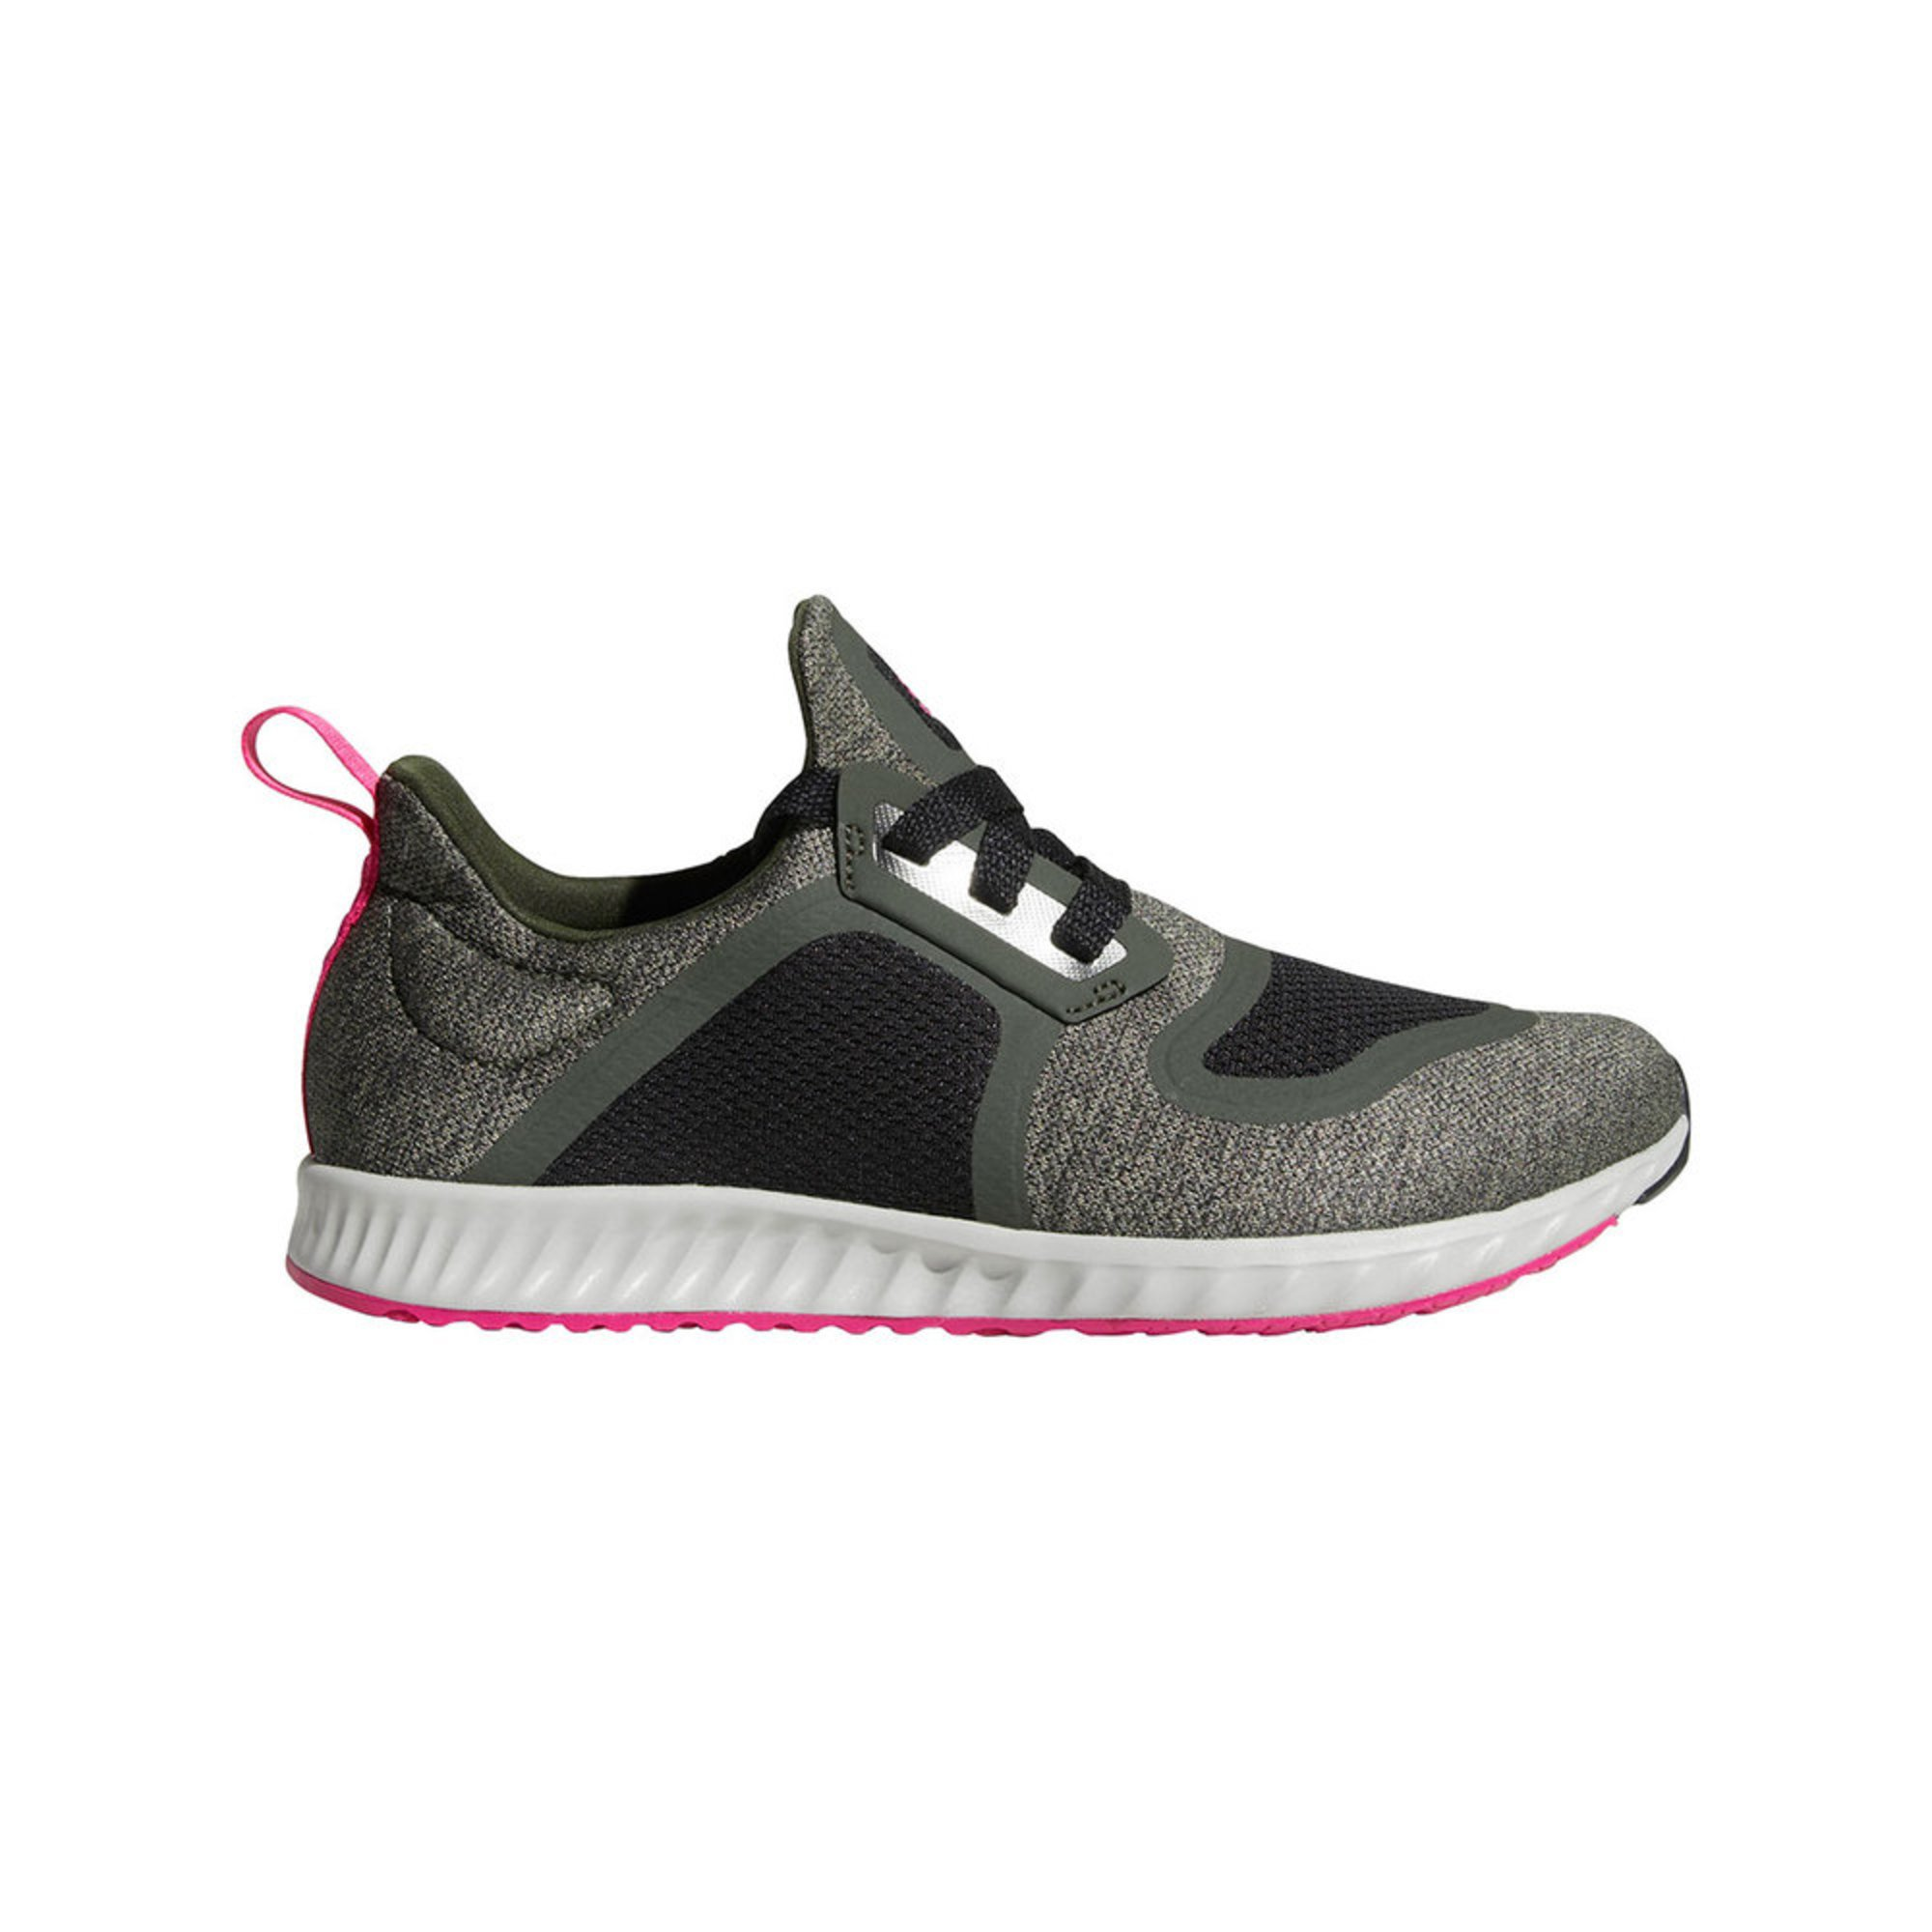 promo code a791c 1a38b Adidas Womens Edge Lux Clima Running Shoe  Womens Running Sh